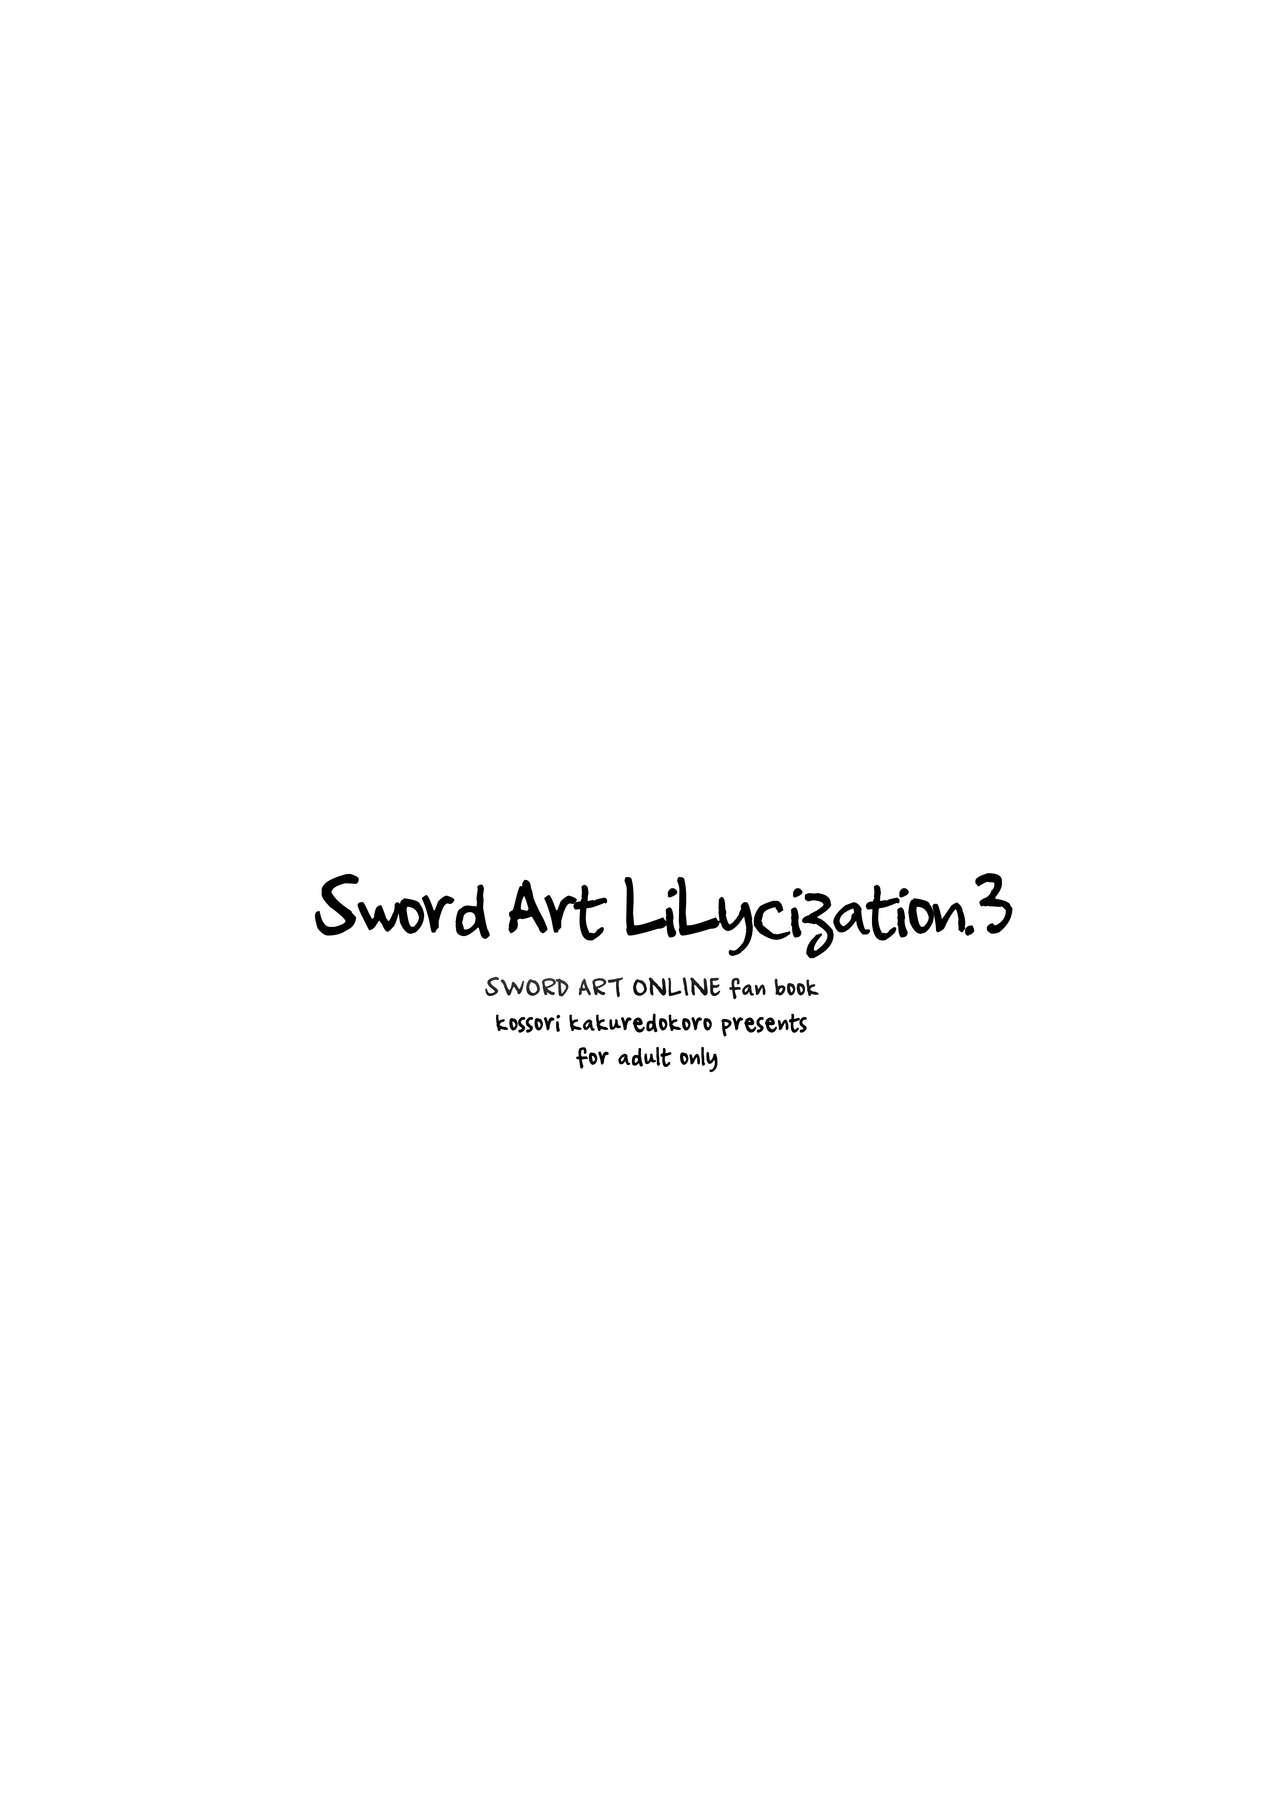 Sword Art Lilycization.3 19